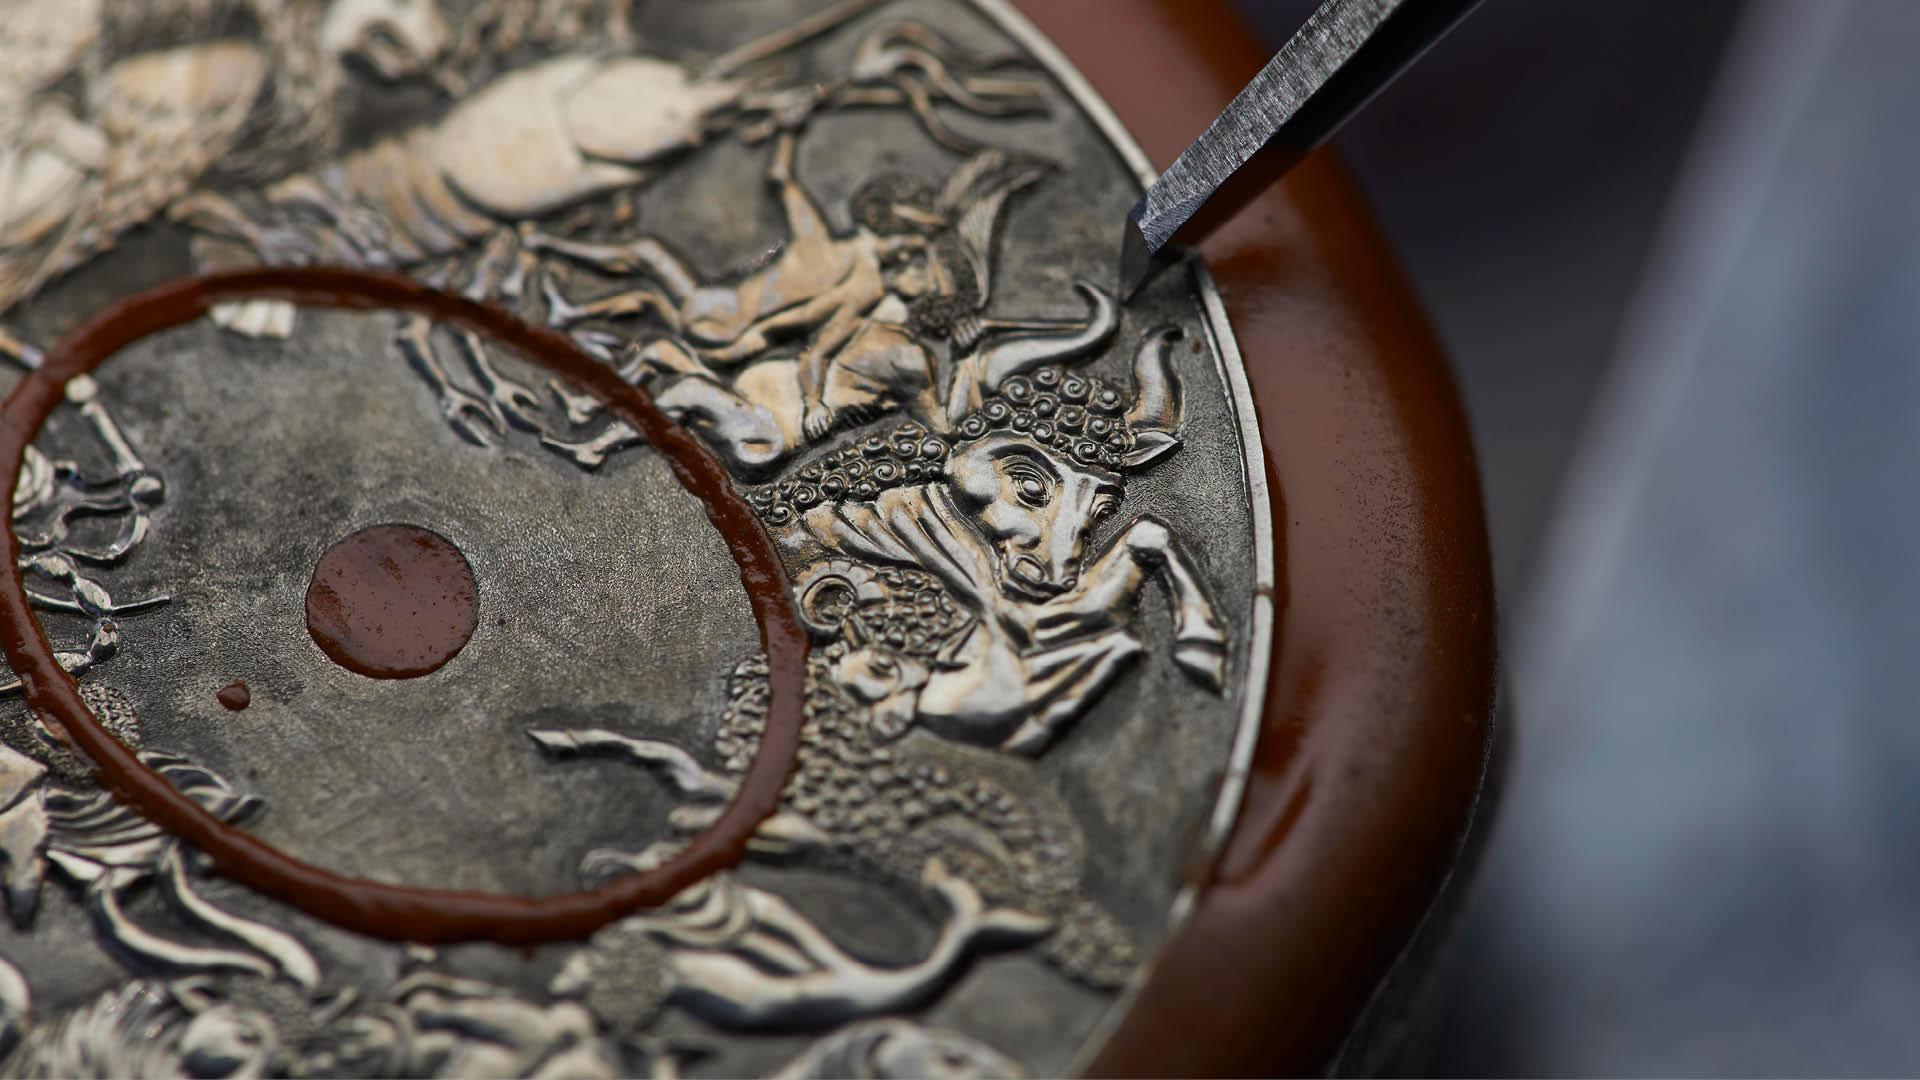 Vacheron Constantin Hand Engraved Copernicus